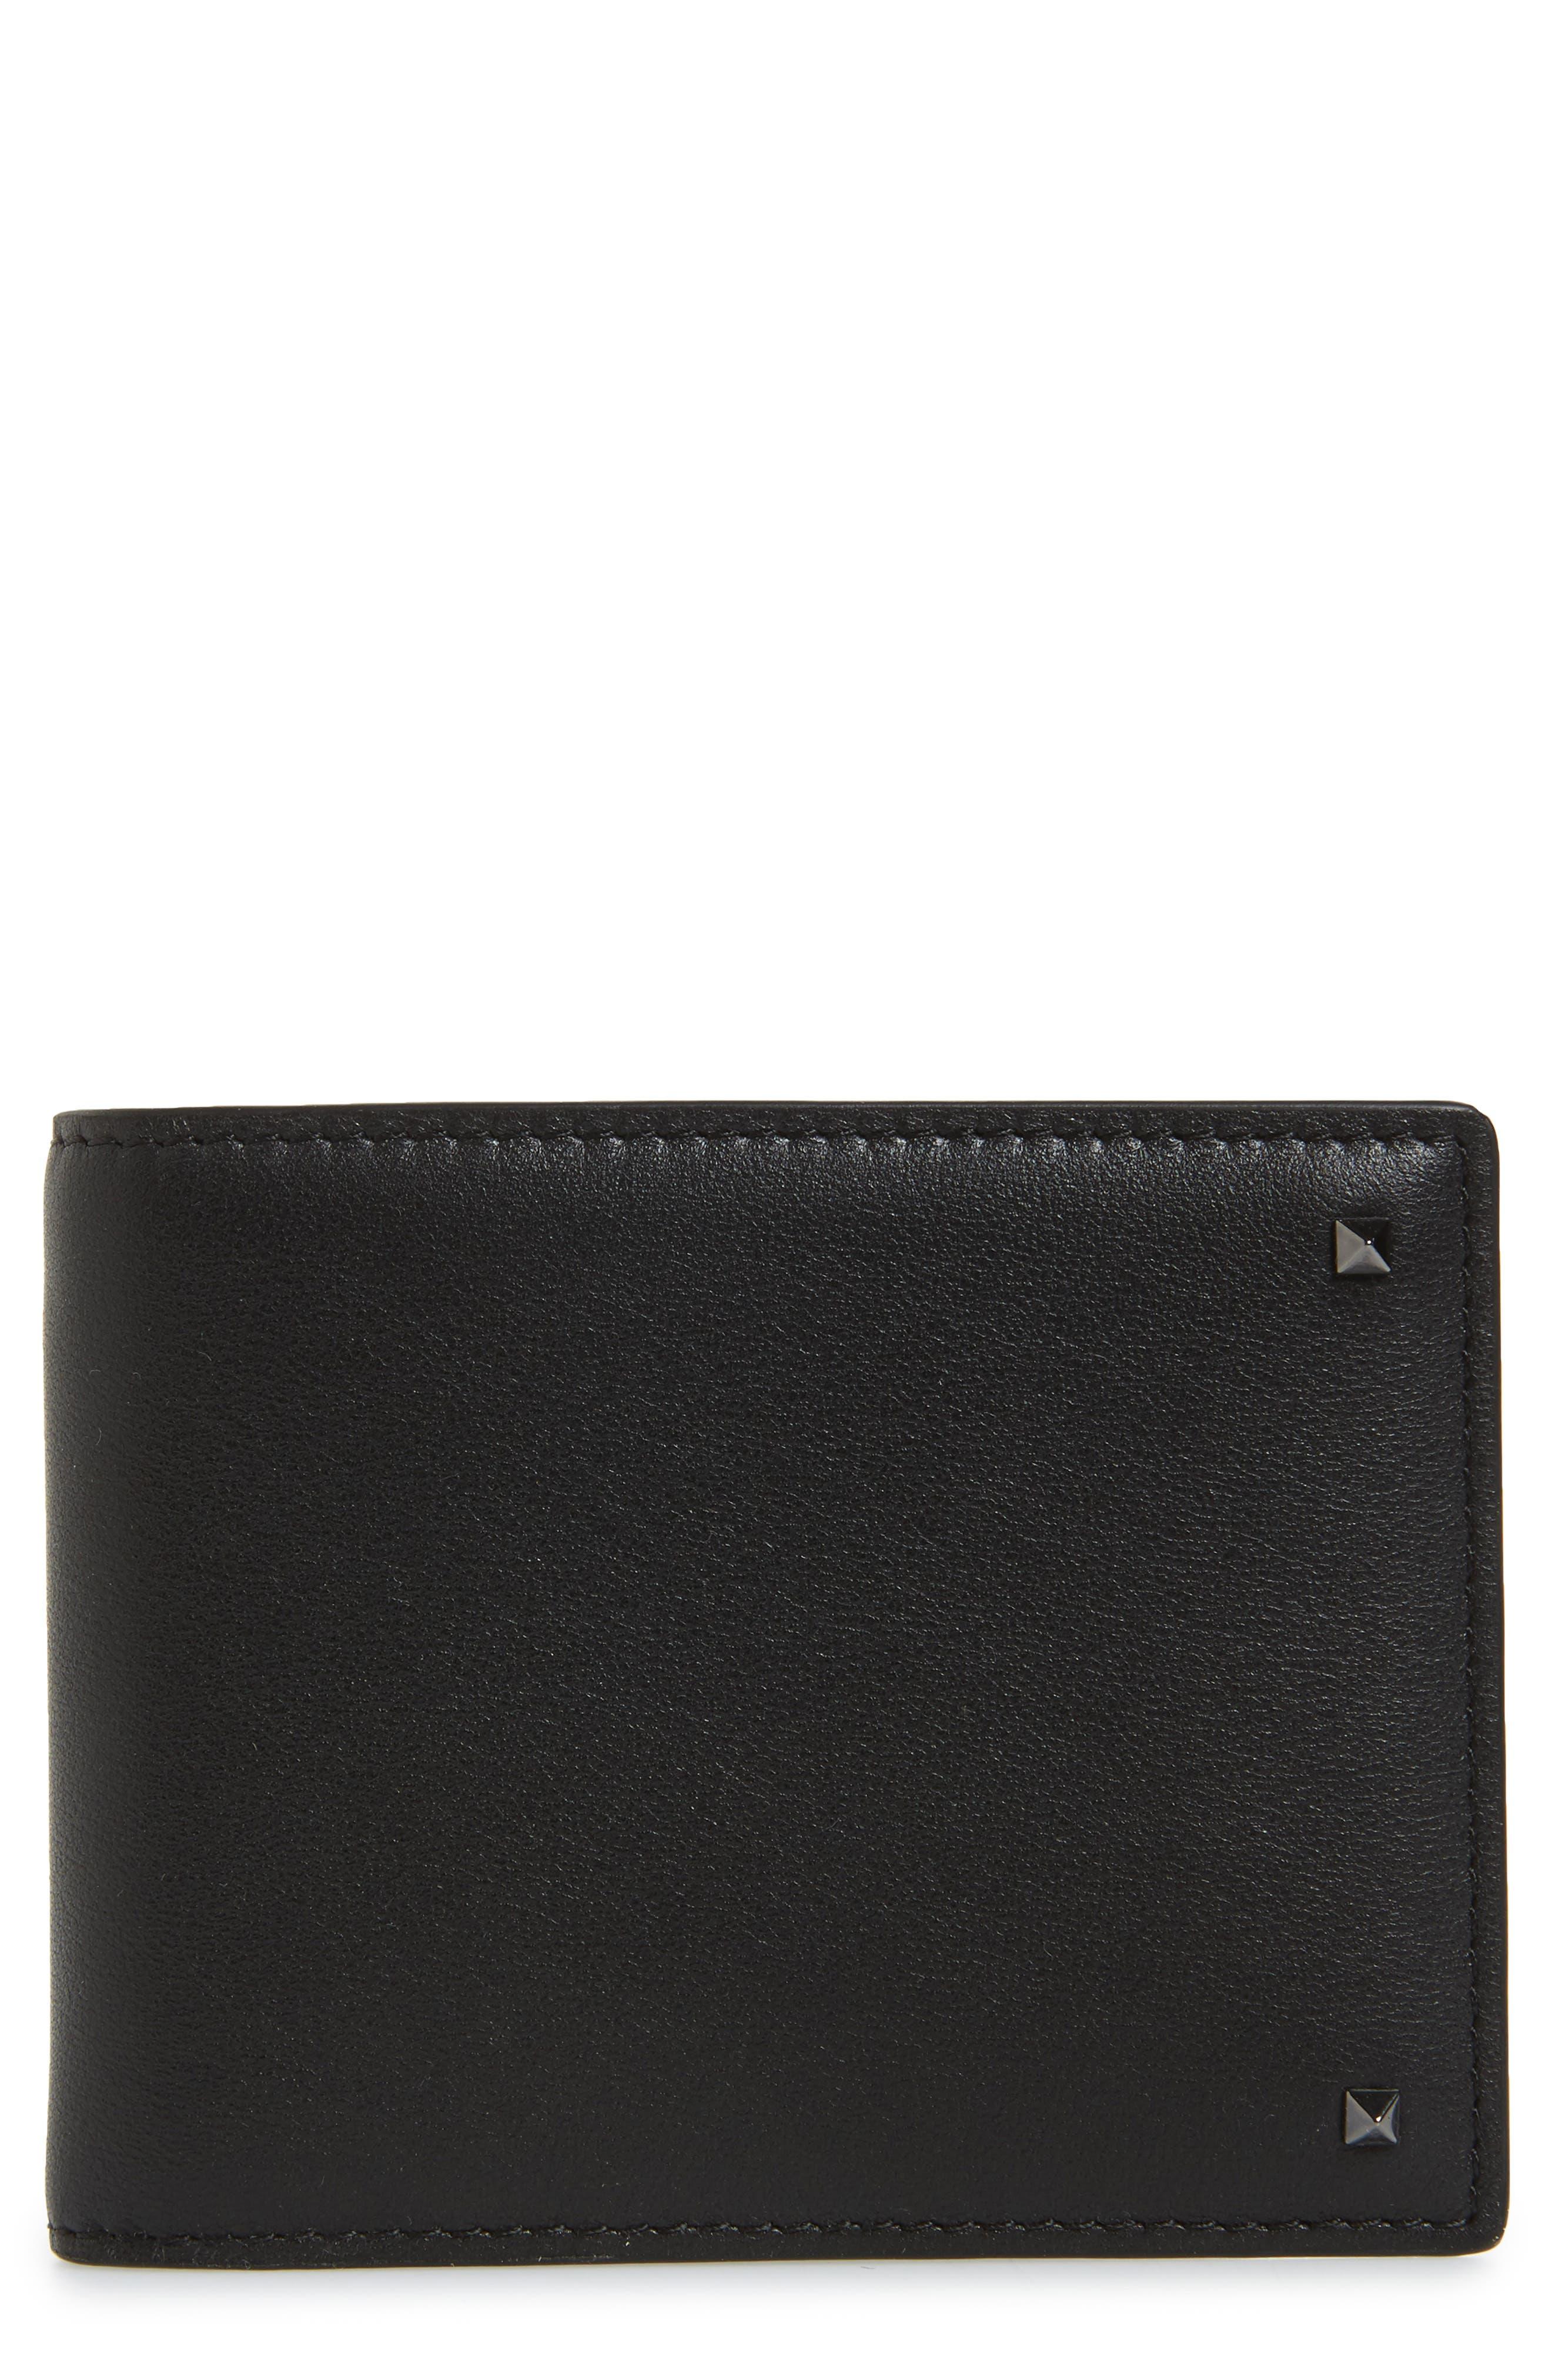 VALENTINO GARAVANI Stud Leather Money Clip Card Case